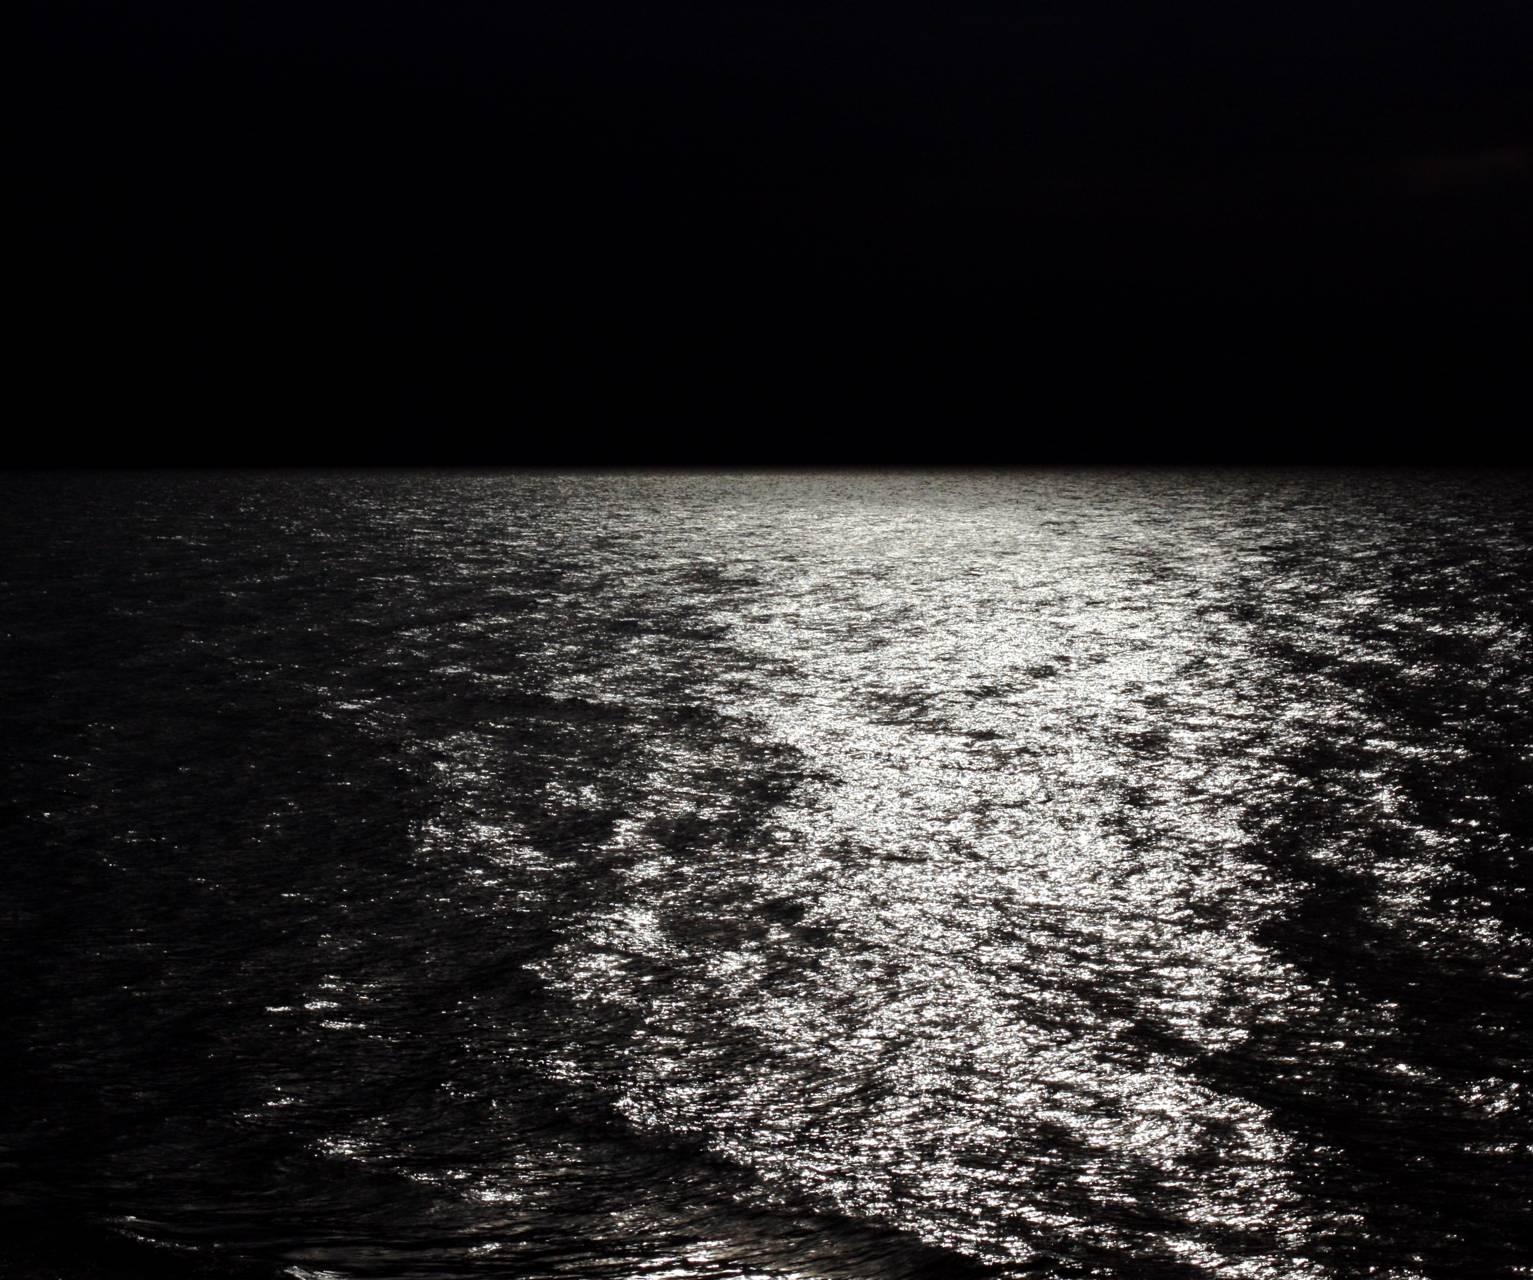 Horizon Hd